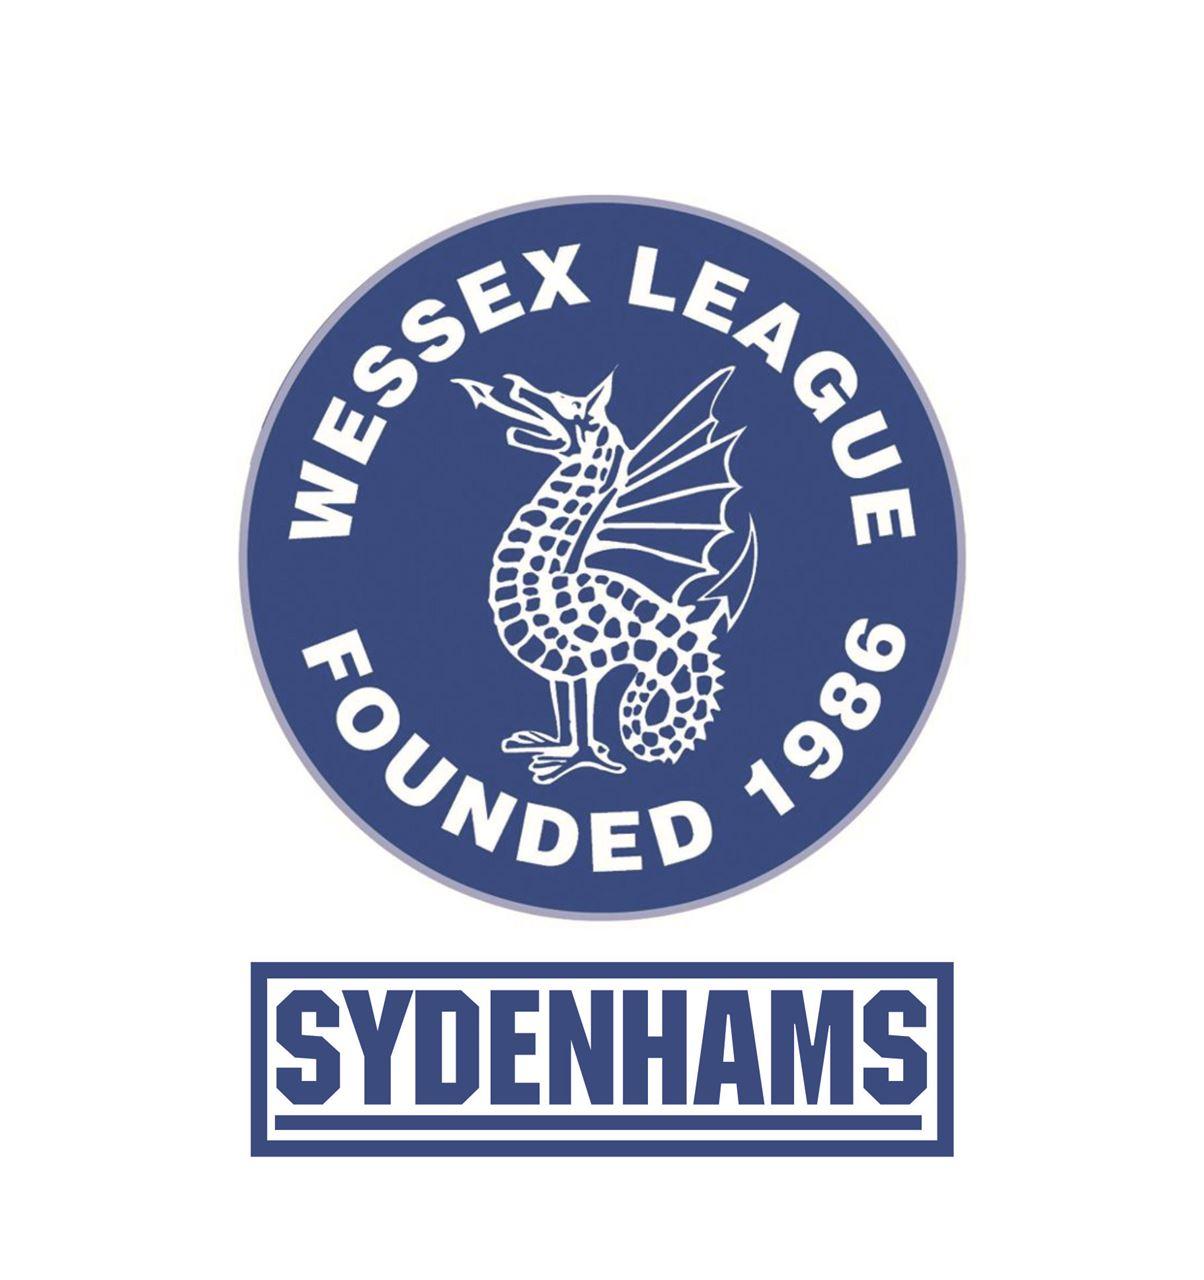 Club Image for Sydenham Wessex Football League (CLUBS)